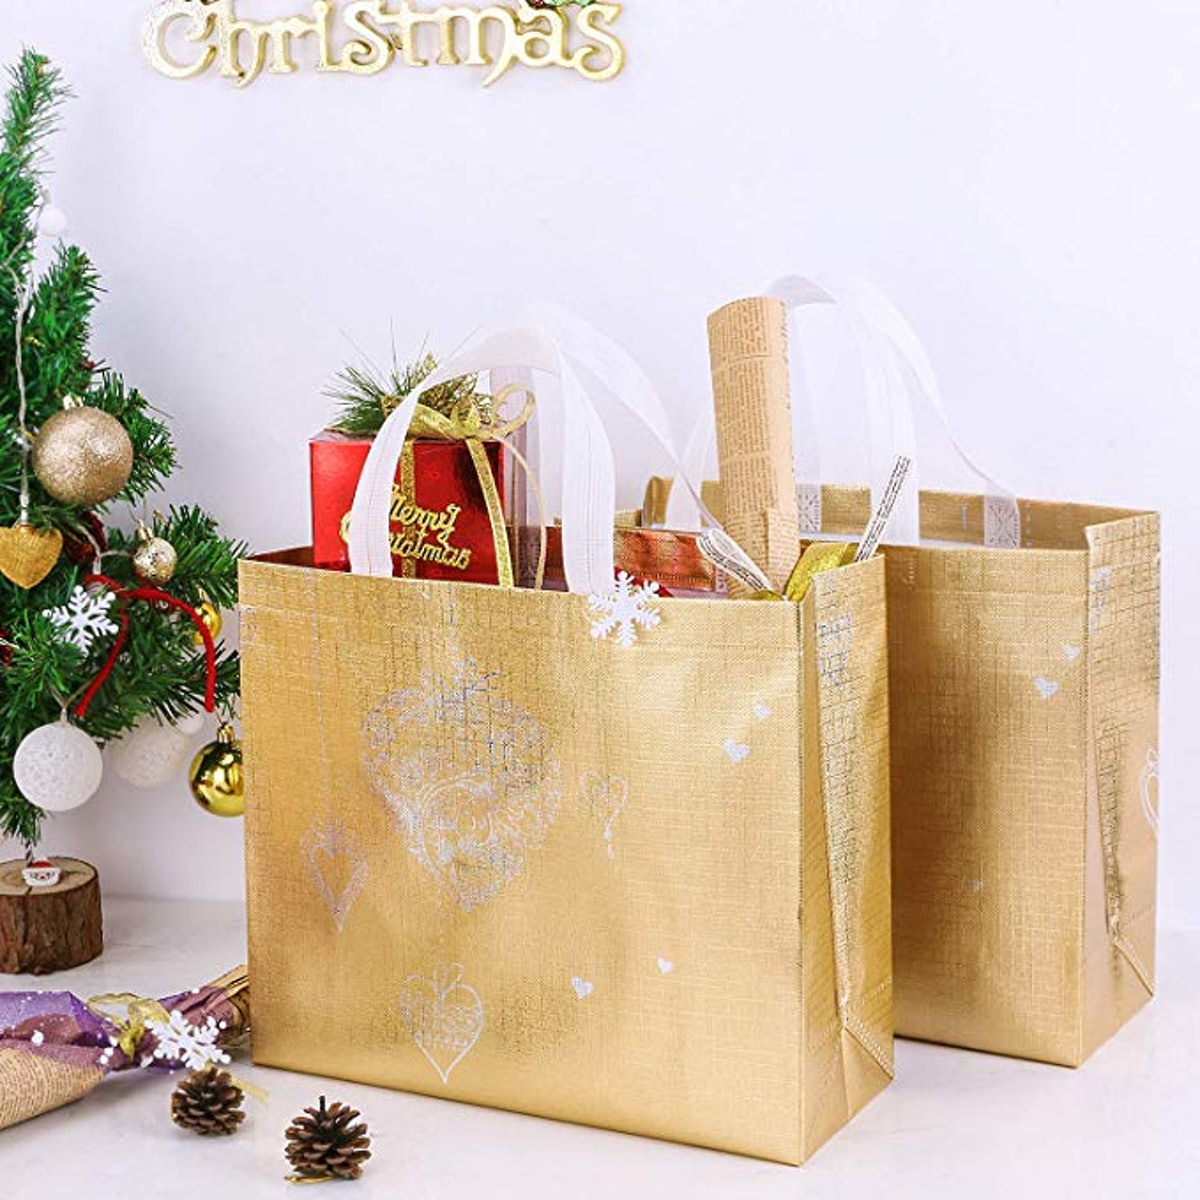 Gesodant Reusable Grocery Bag (10 pack)